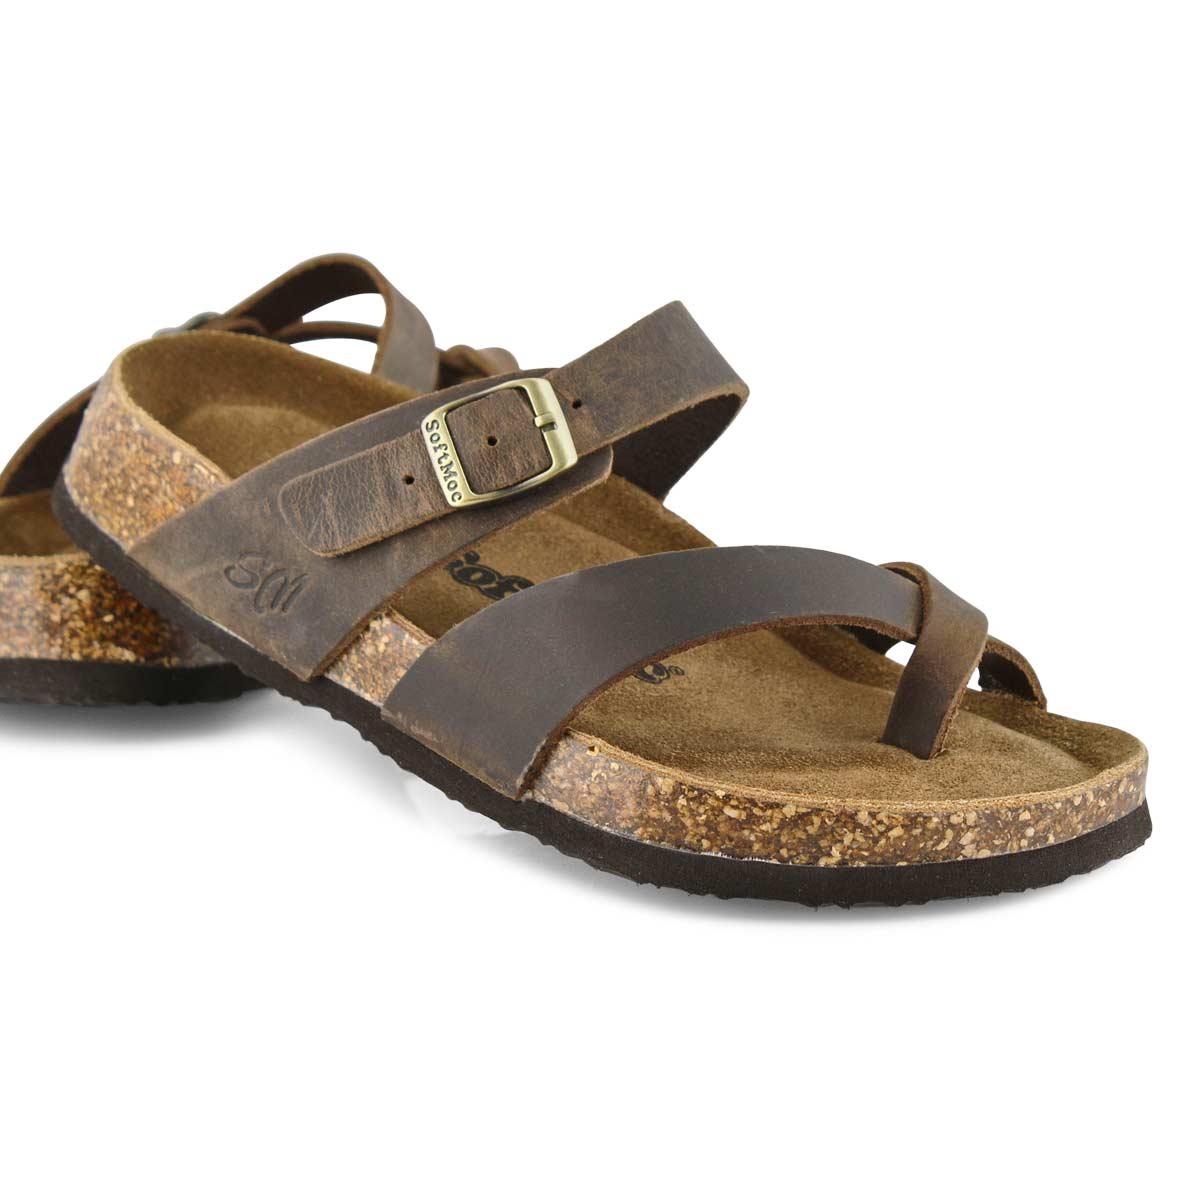 Lds Alicia 5 brn crz memory foam sandal